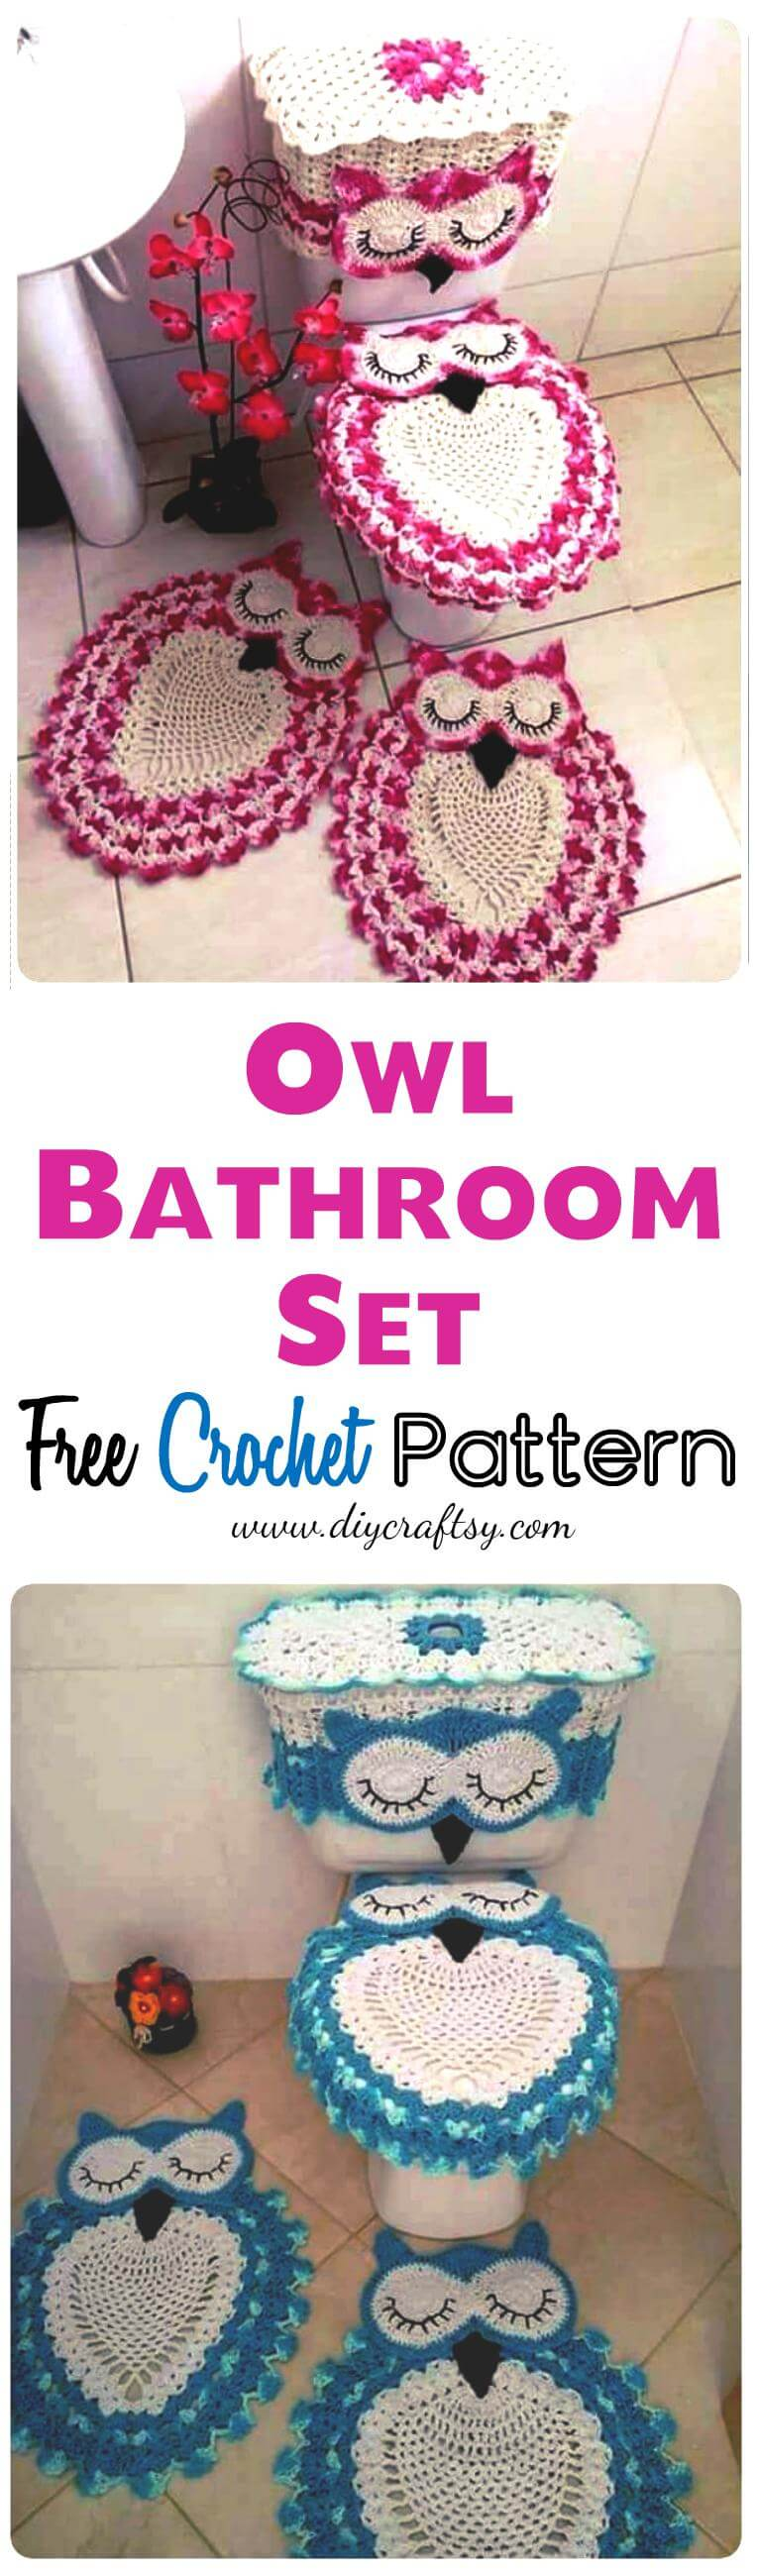 Owl Bathroom Set Free Crochet Pattern Diy Crafts